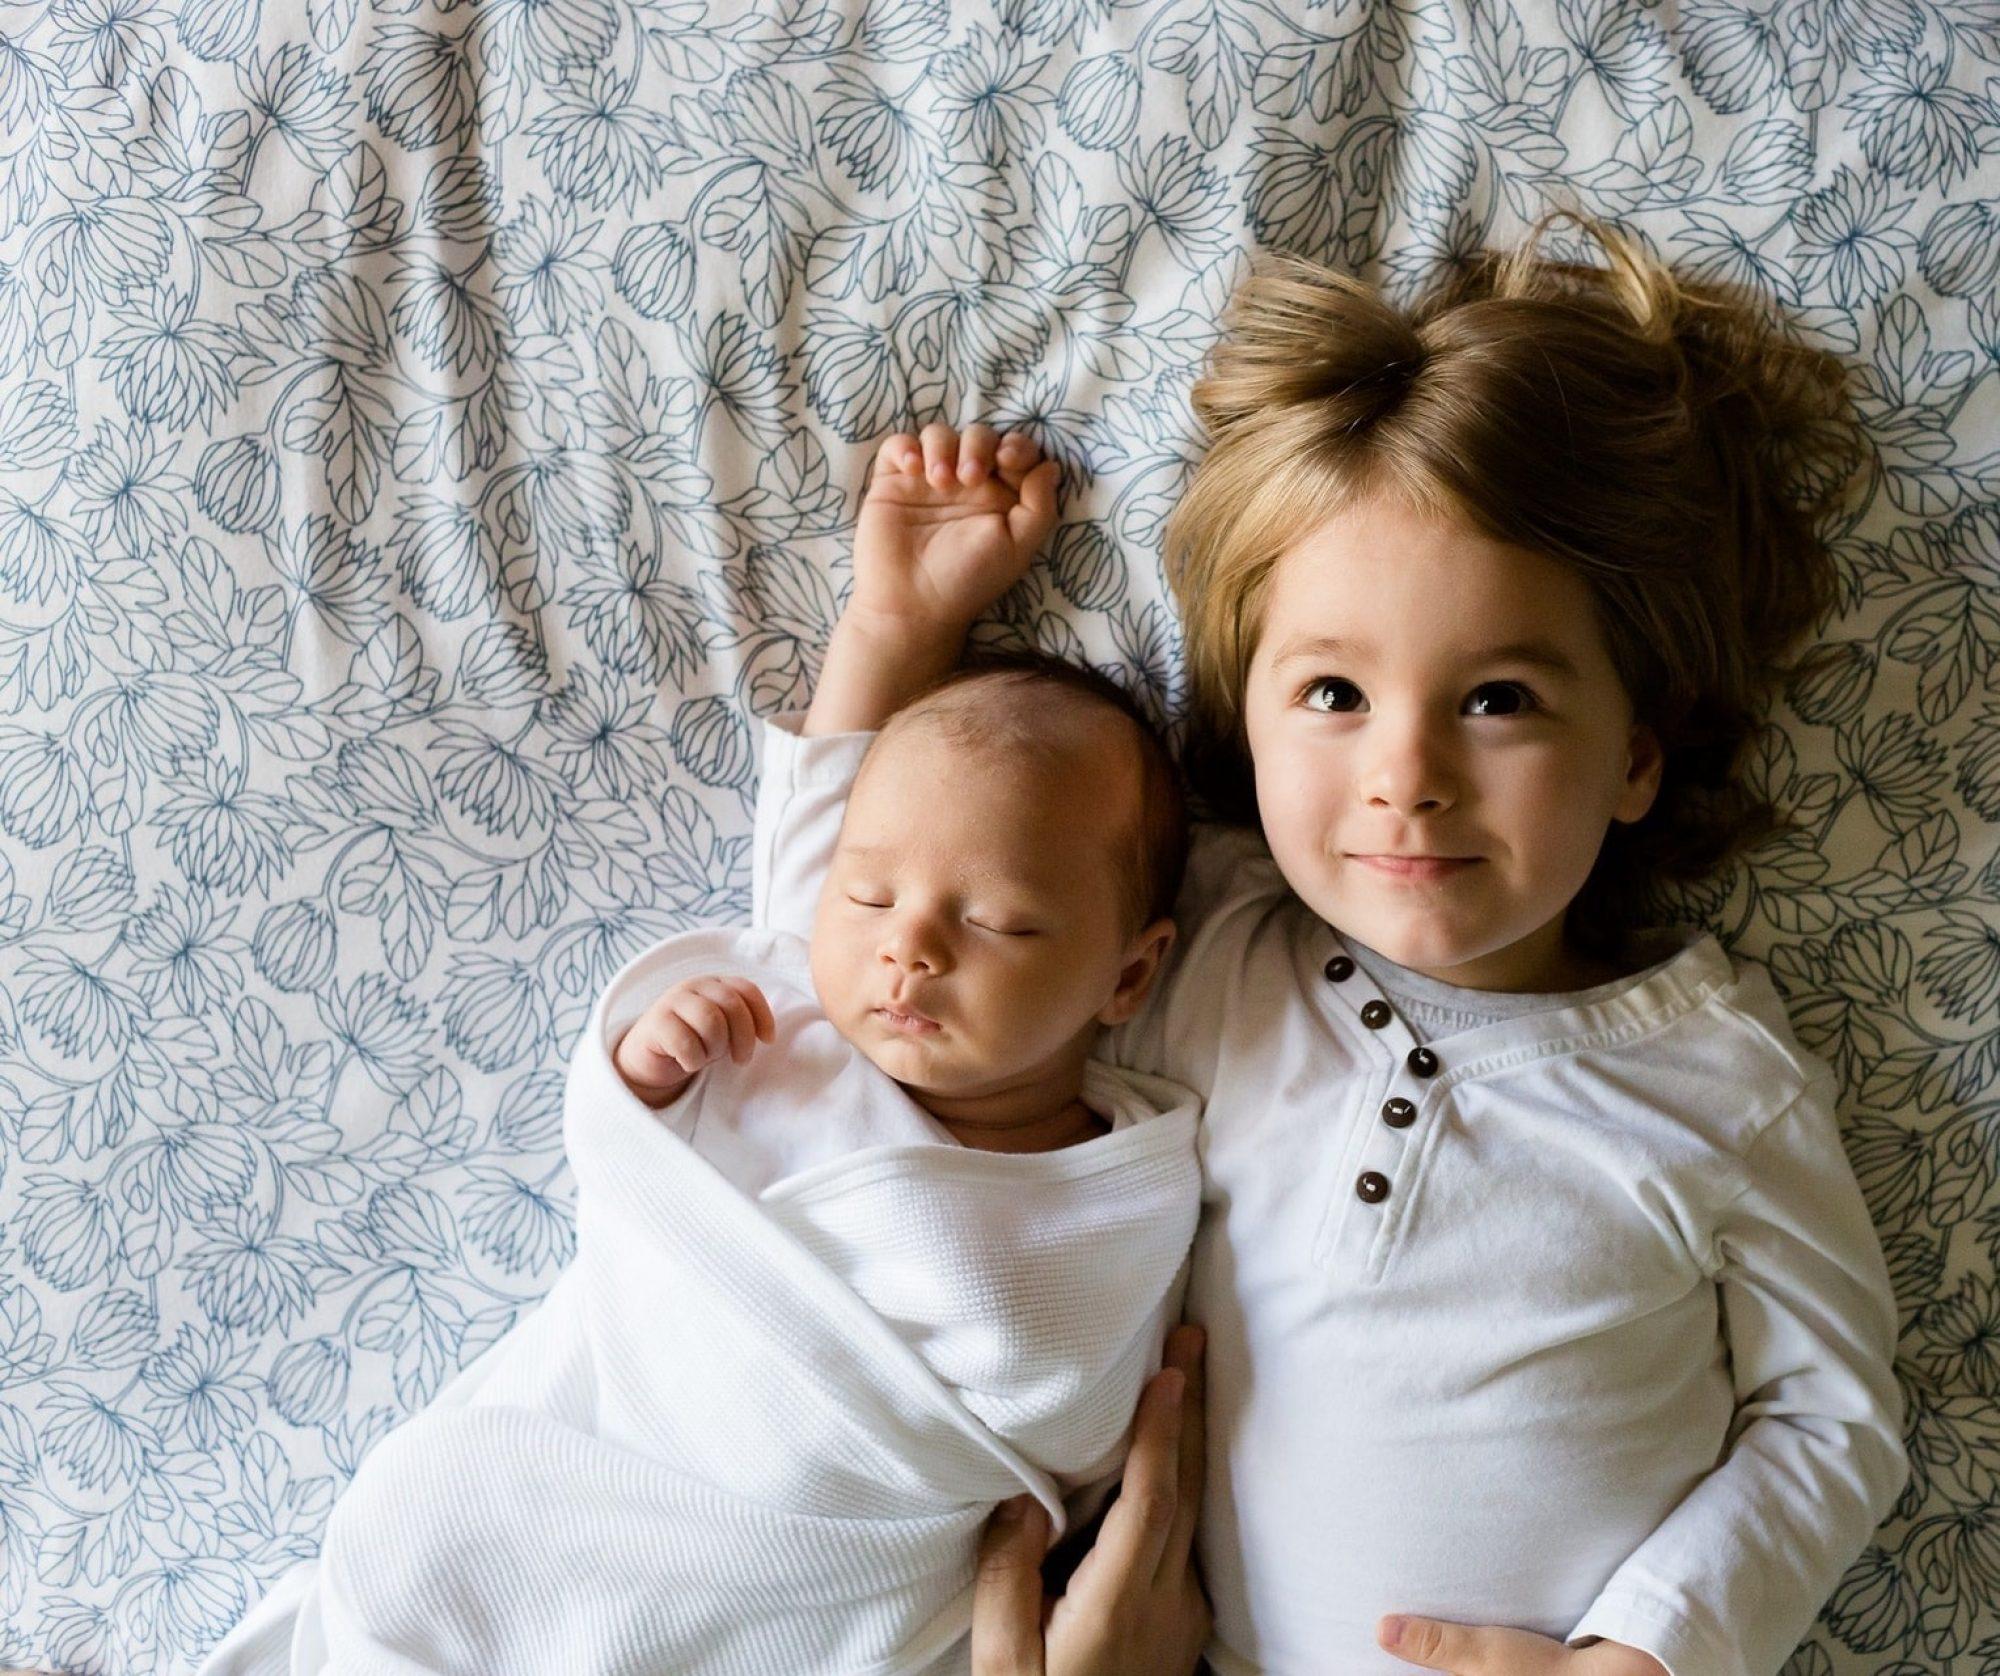 Paediatrica- Ολοκληρωμενη Παιδιατρικη Φροντιδα